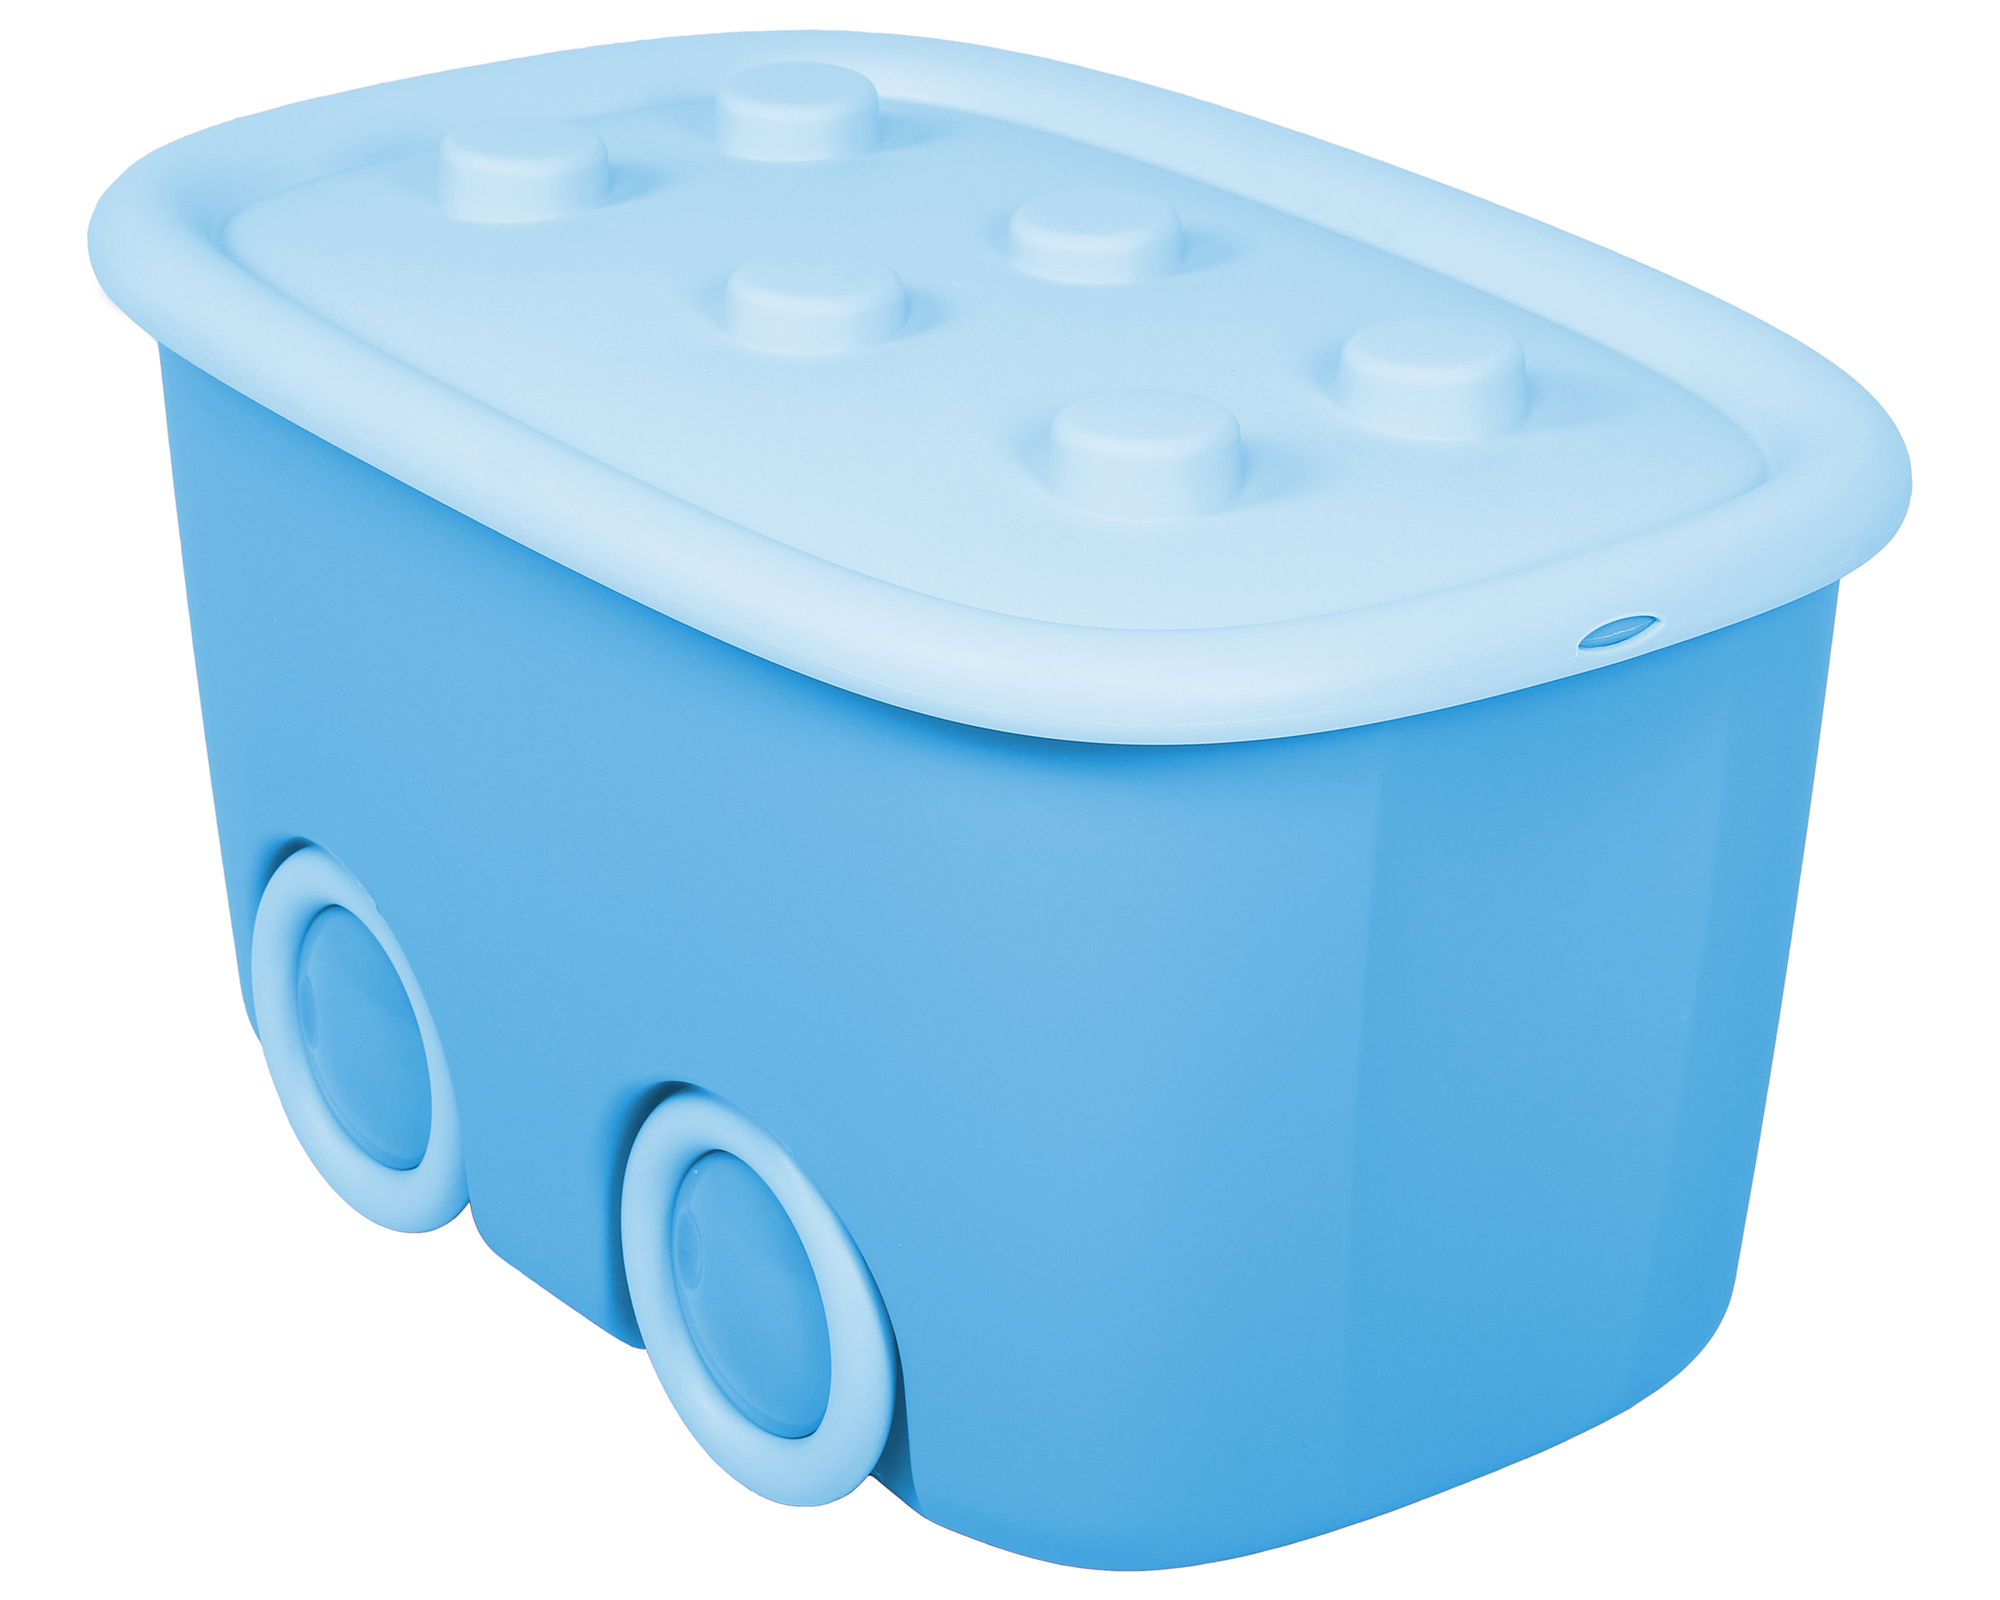 ondis24 spielzeugbox funny hellblau g nstig online kaufen. Black Bedroom Furniture Sets. Home Design Ideas